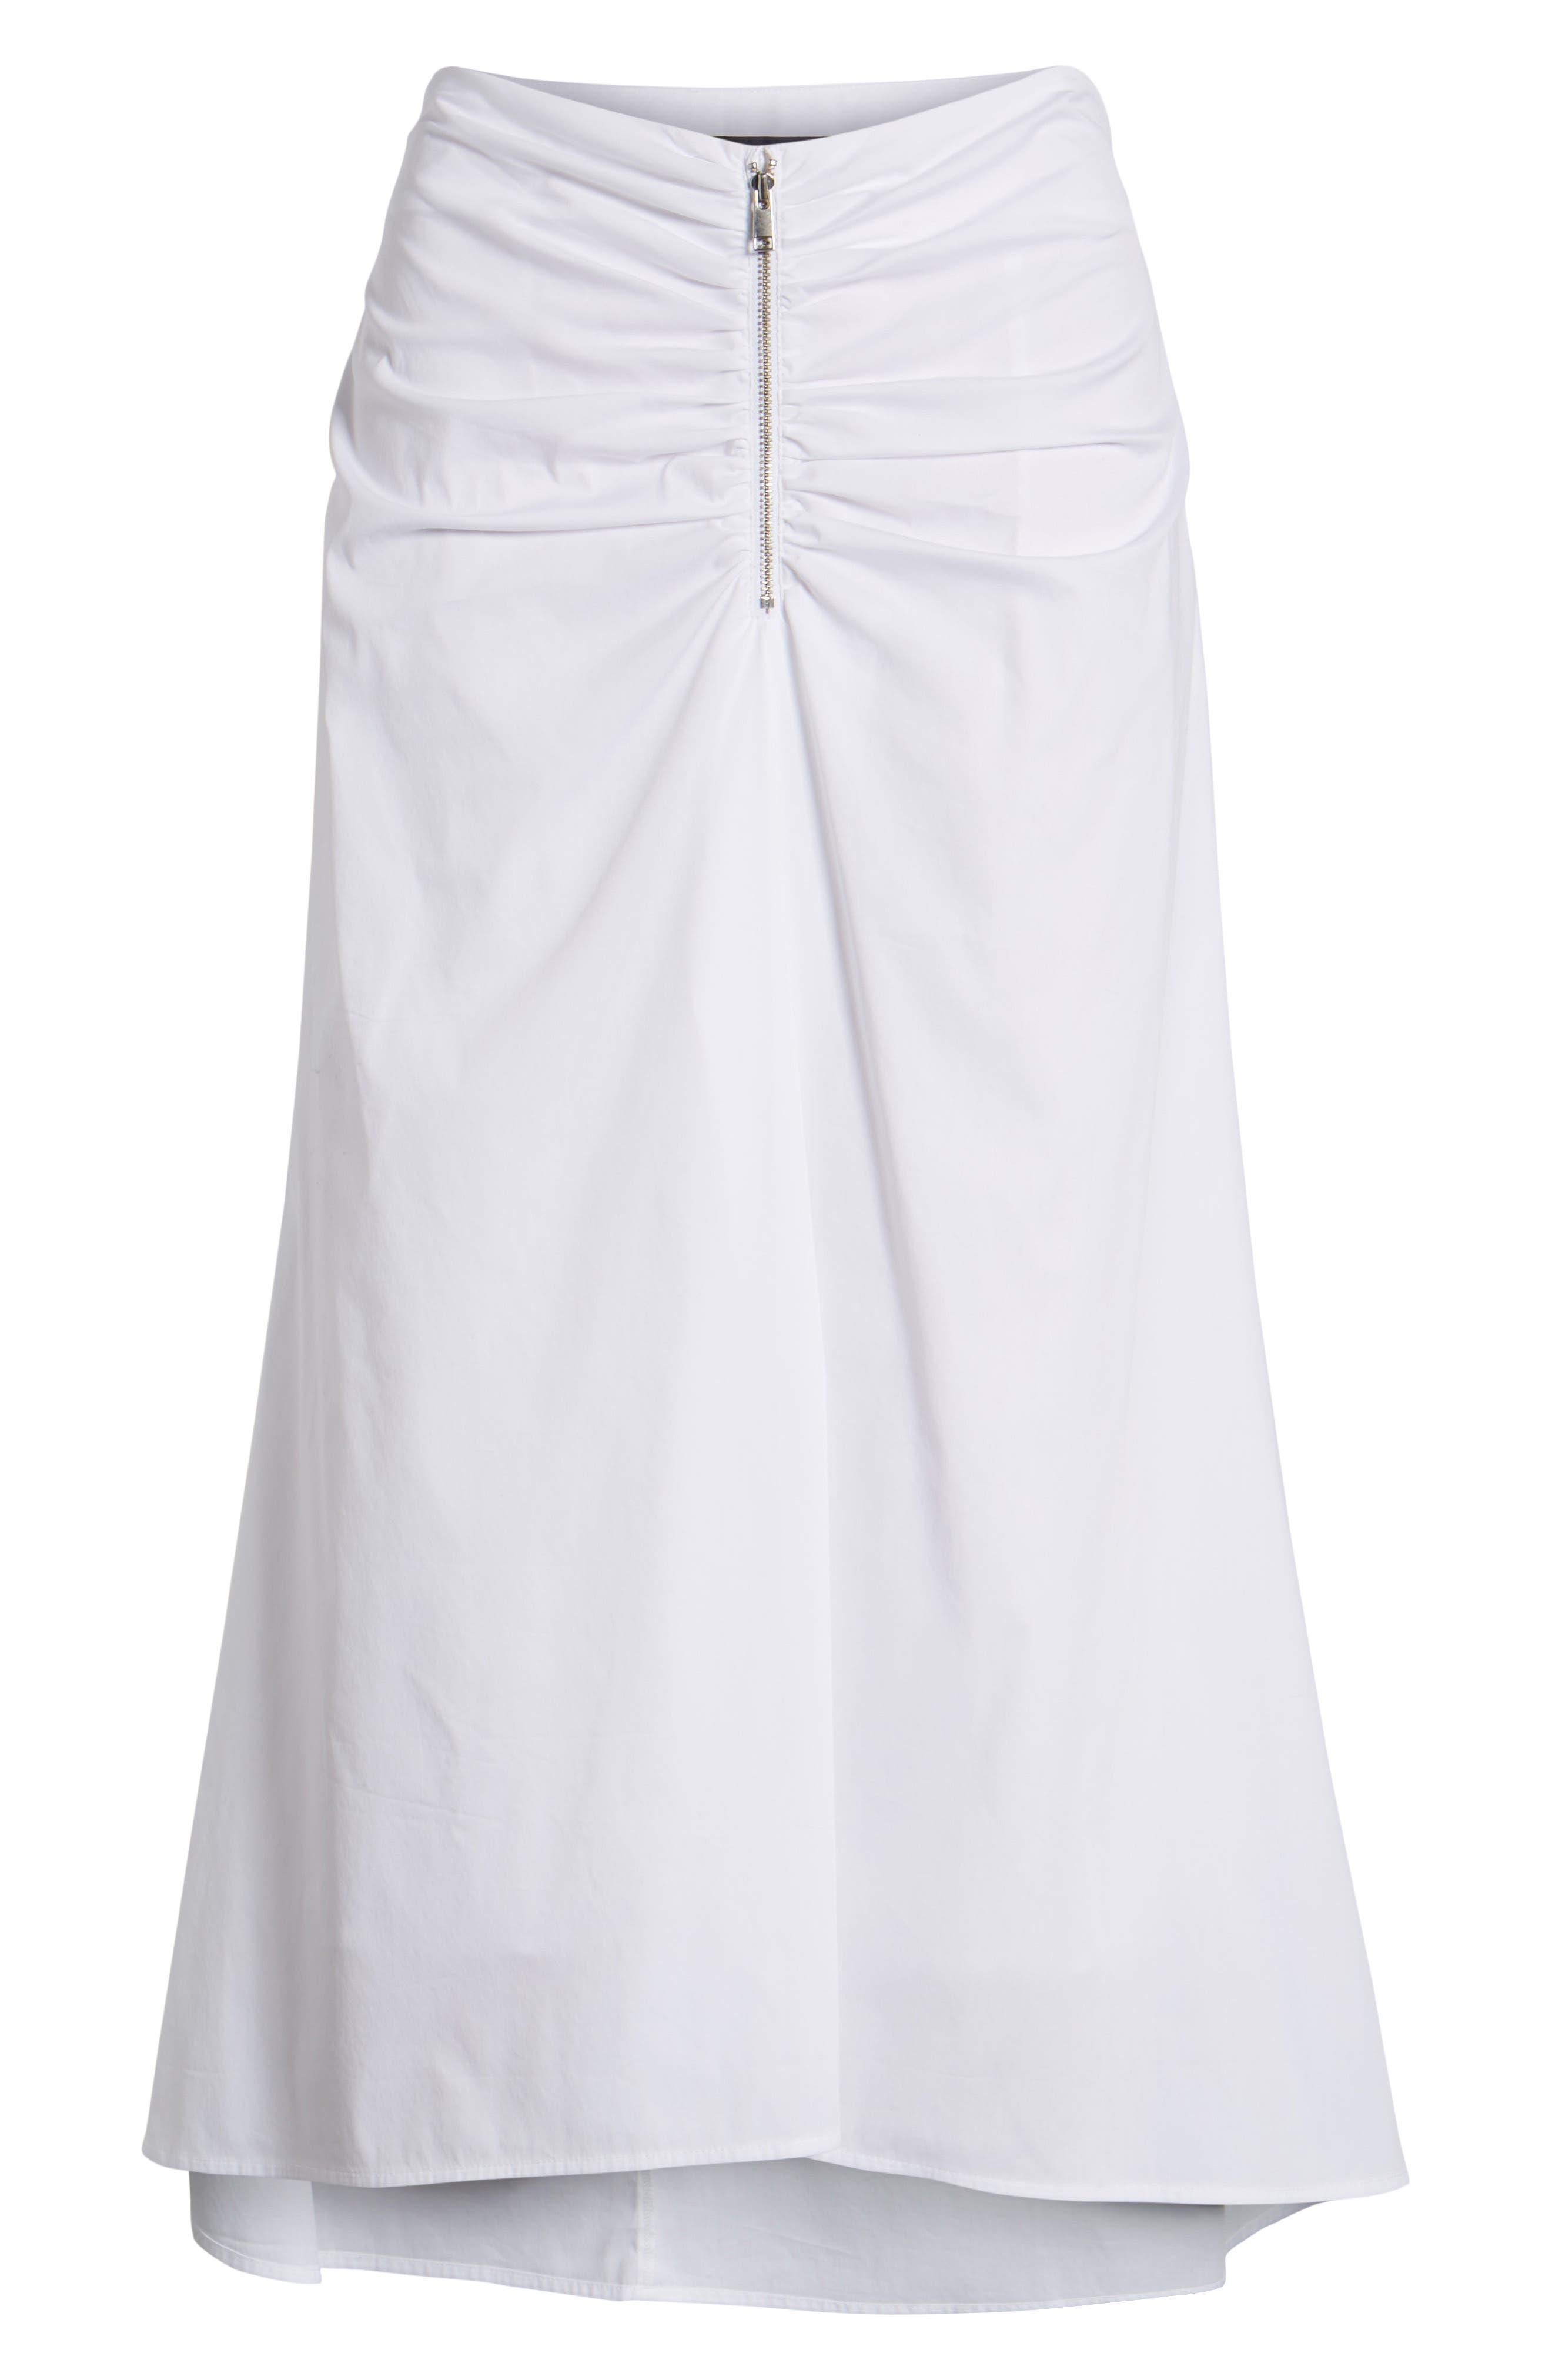 Ruched Front Midi Skirt,                             Alternate thumbnail 6, color,                             White